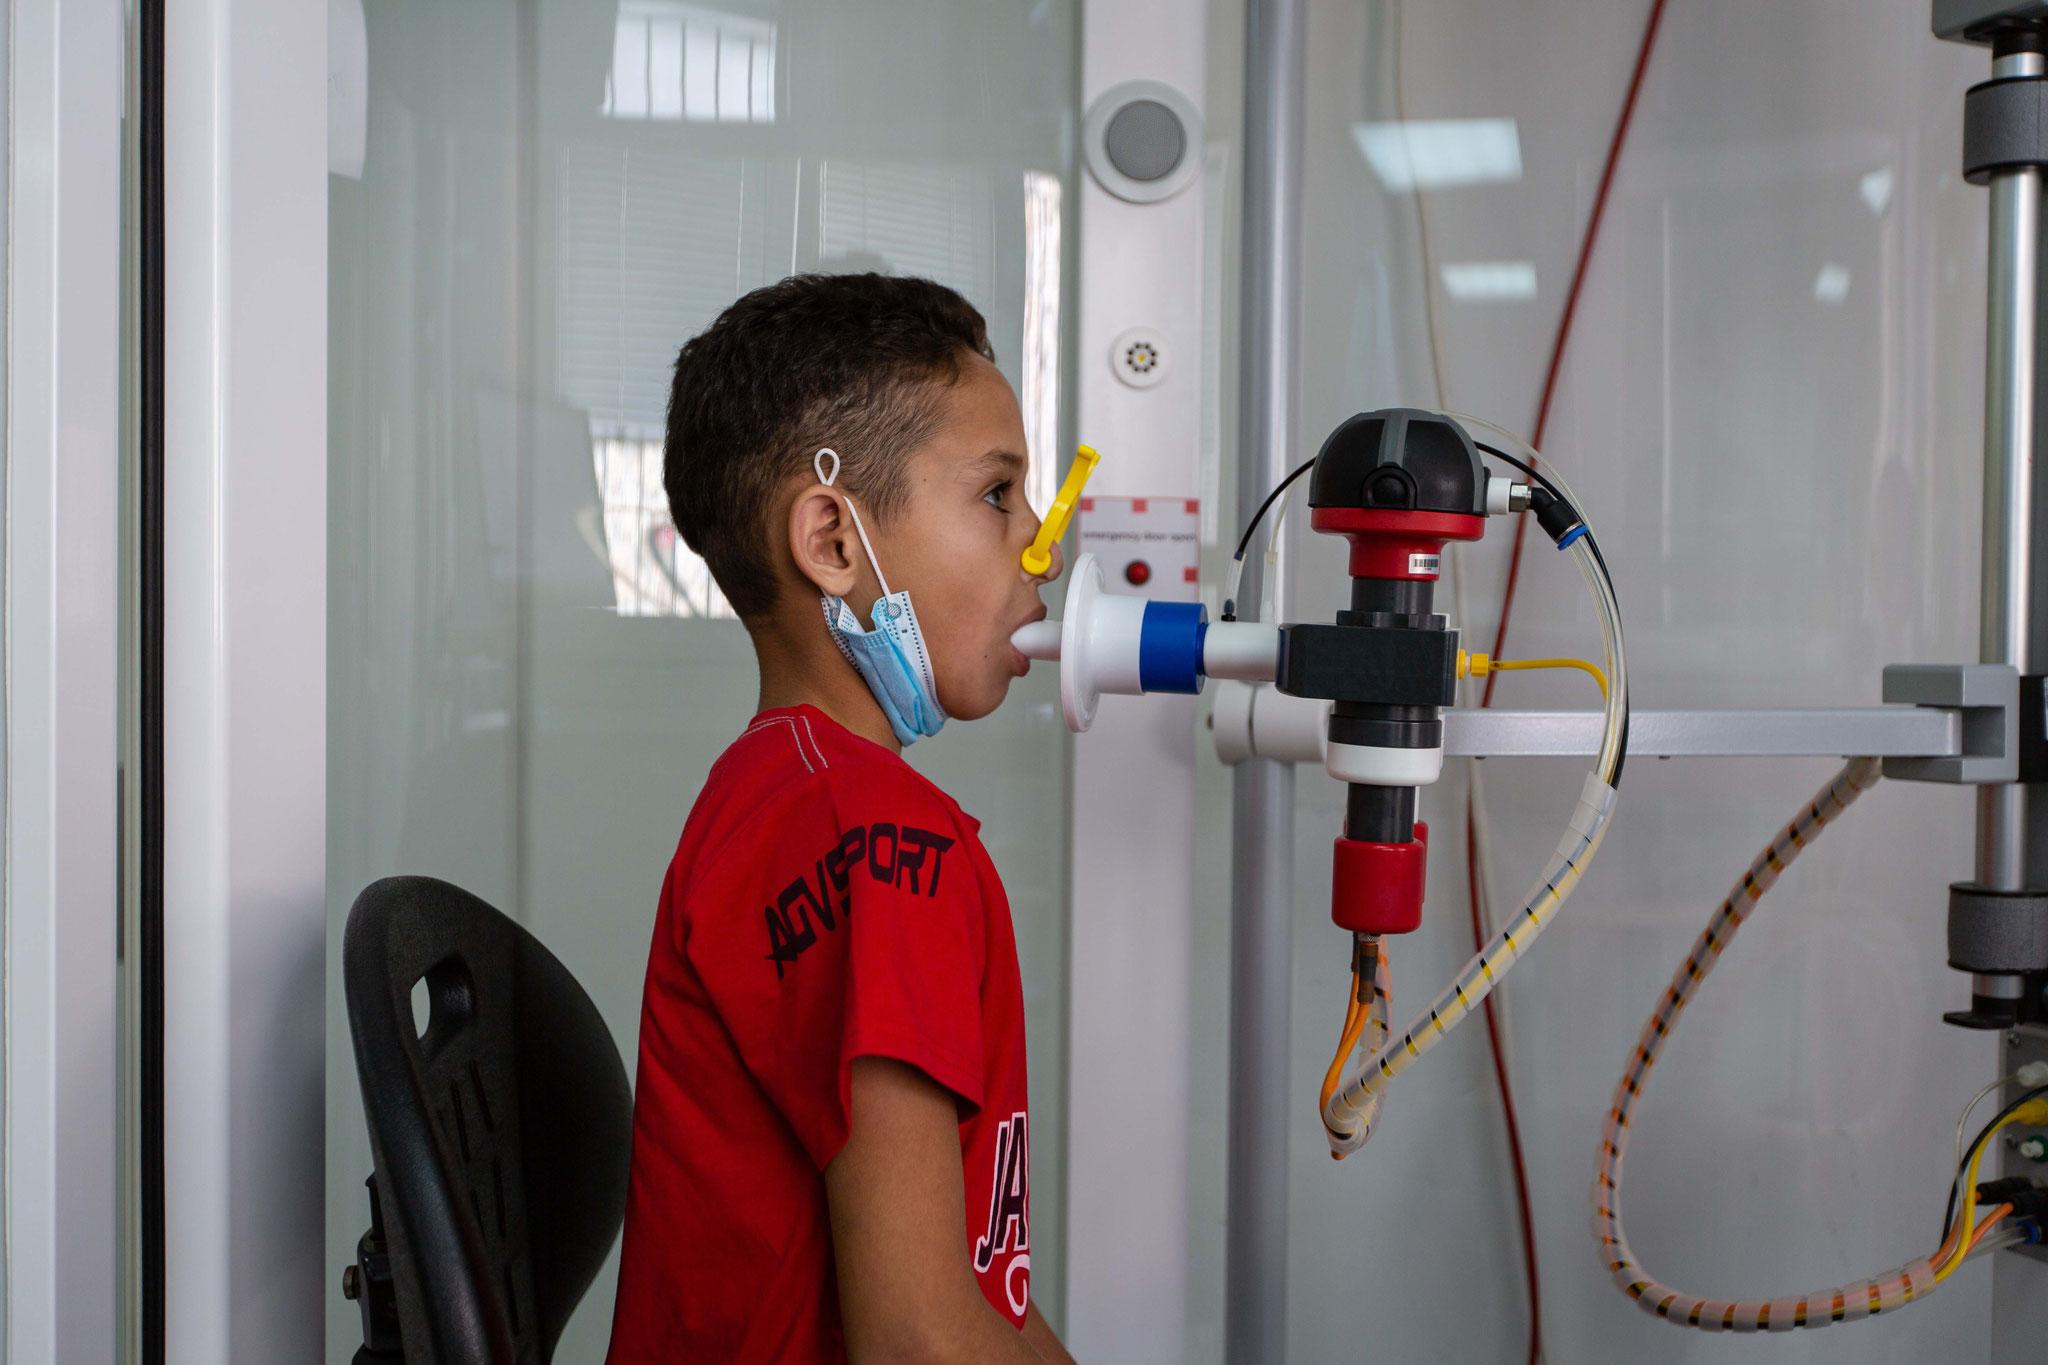 Qais (9) muss sich beim Lungenfunktionstest gut konzentrieren. Foto: Andrea Krogmann